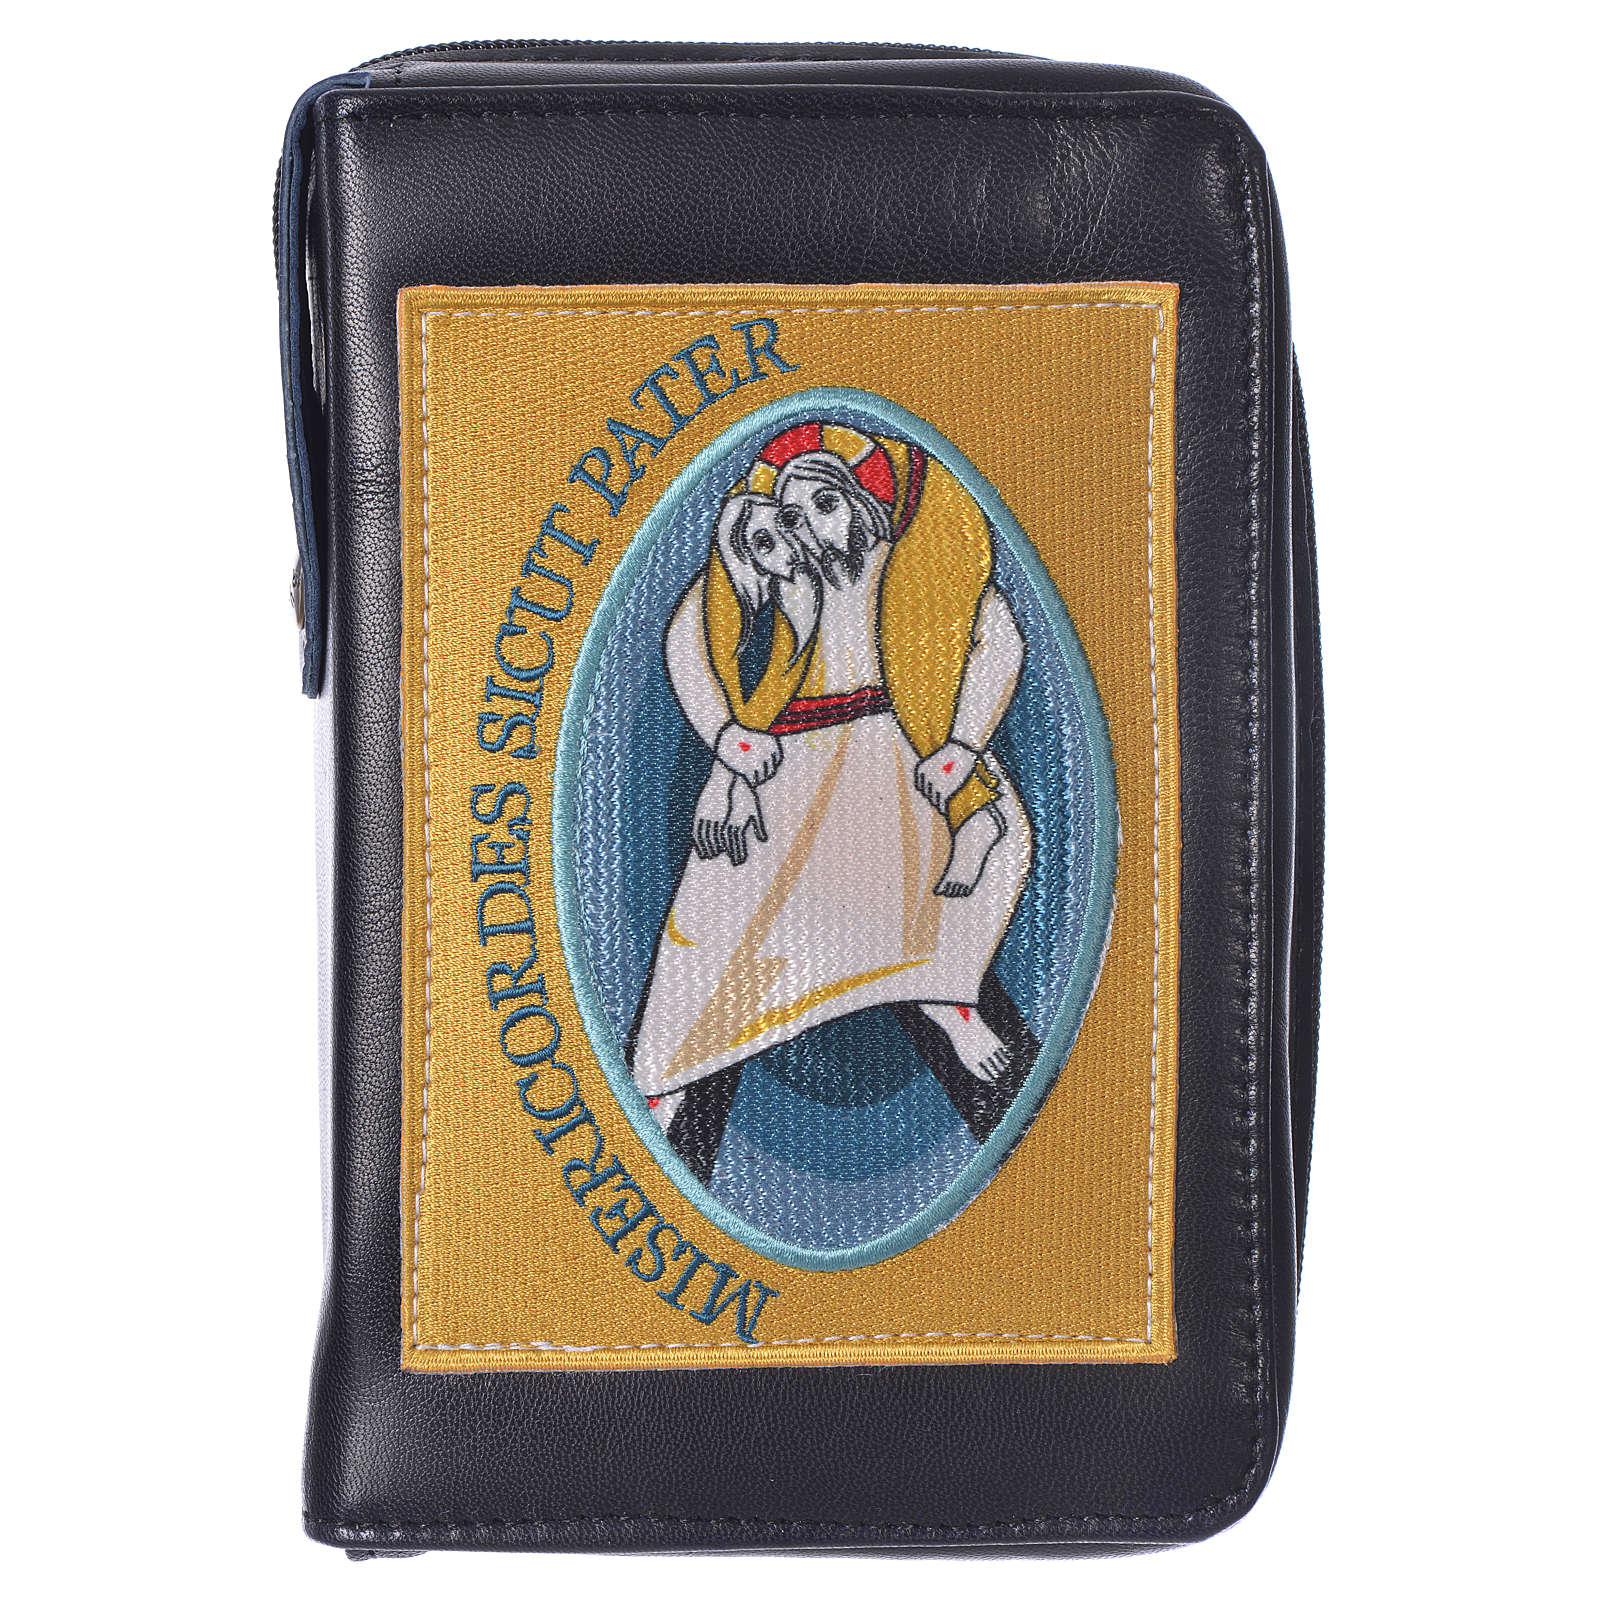 STOCK Custodia Liturgia ore 4 volumi Giubileo Misericordia nera 4